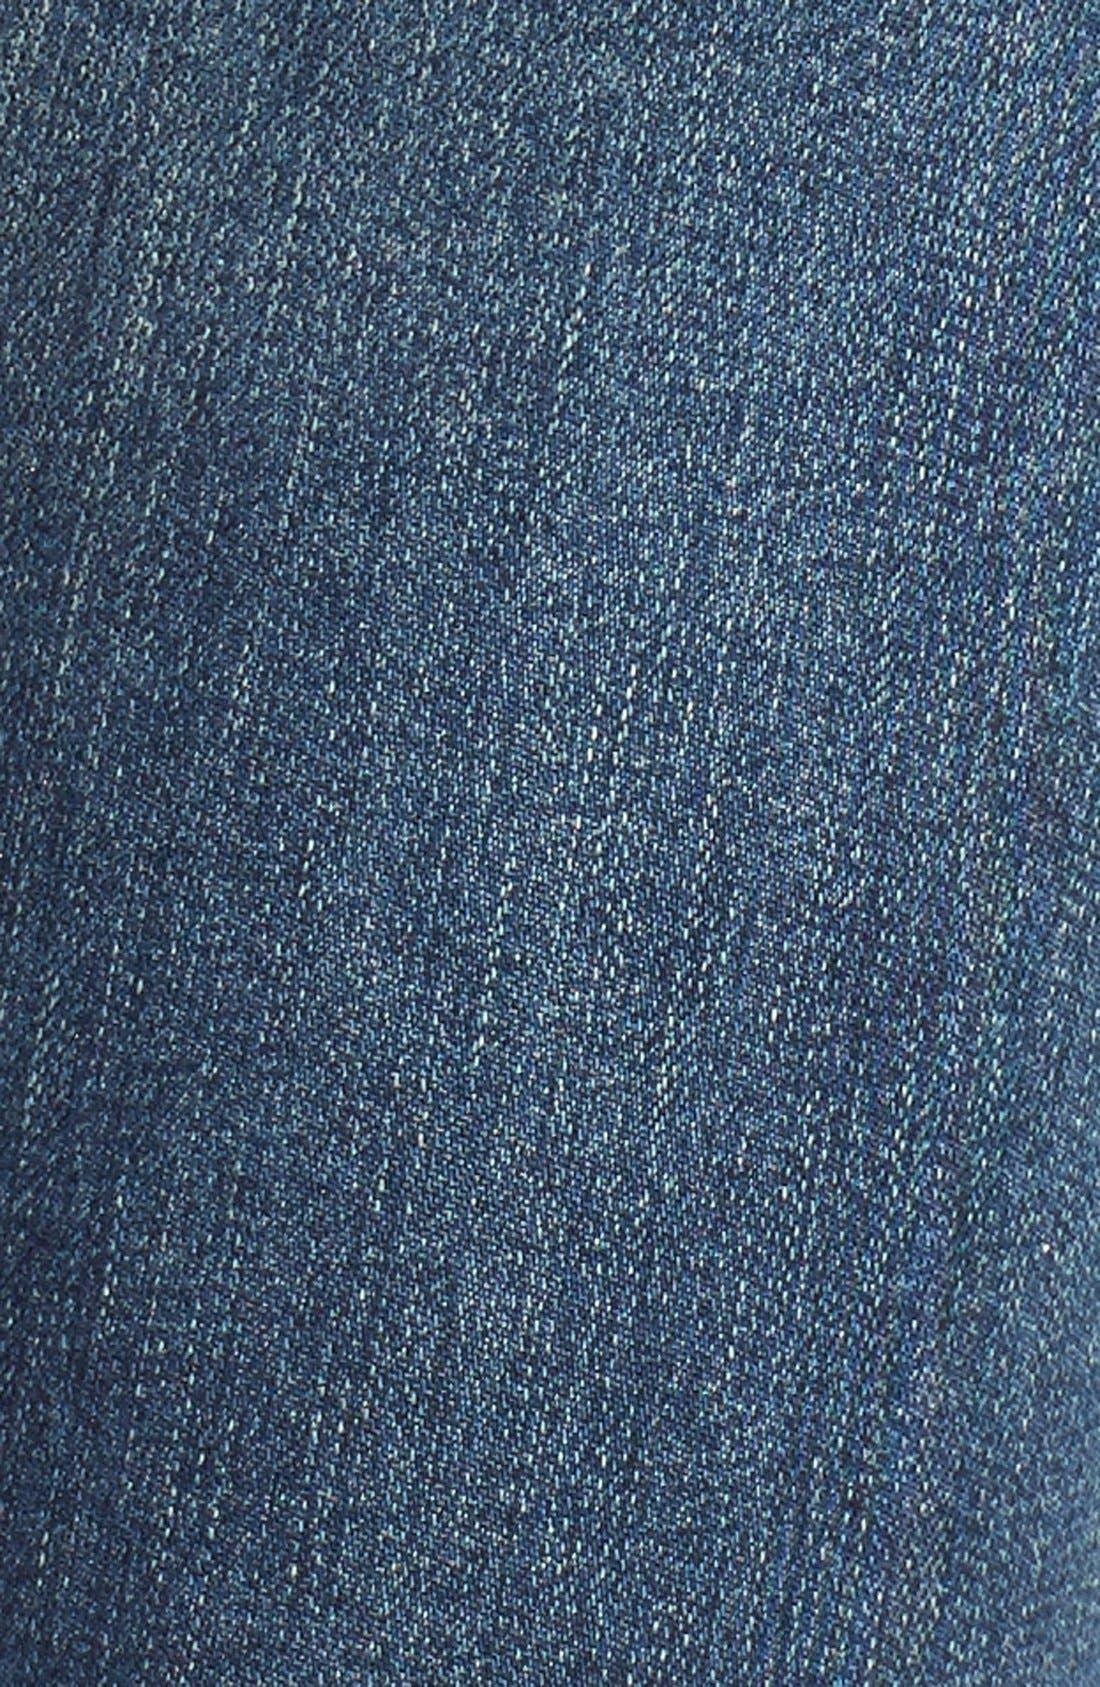 'Sophie' High Rise Skinny Jeans,                             Alternate thumbnail 5, color,                             Kansas City